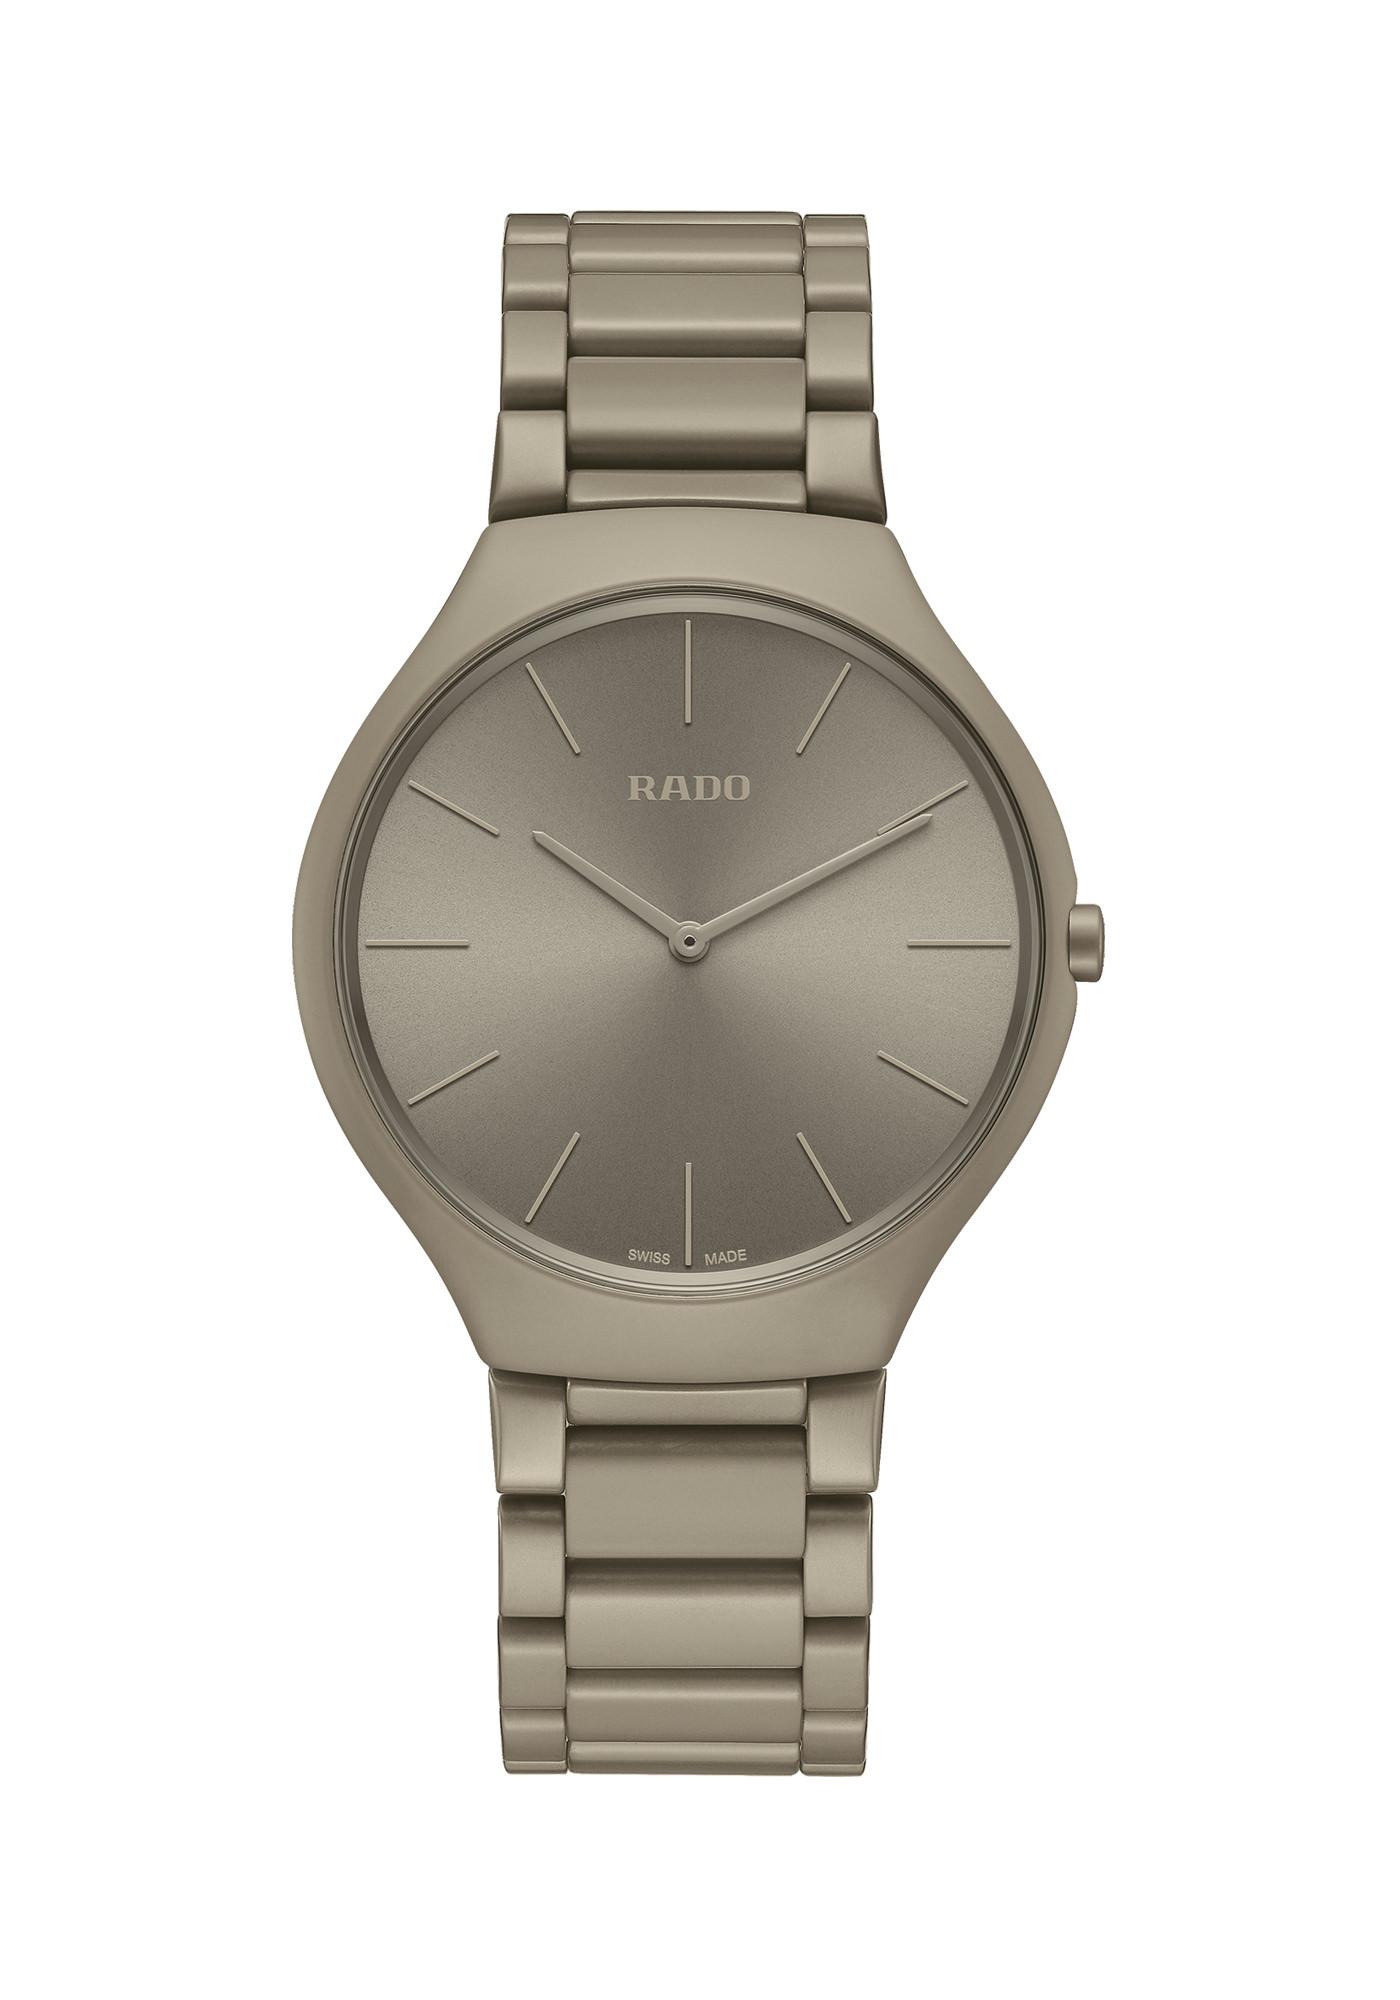 Rado Montres True Thinline Les Couleurs Le Corbusier Grey Brown Natural Umber 32141